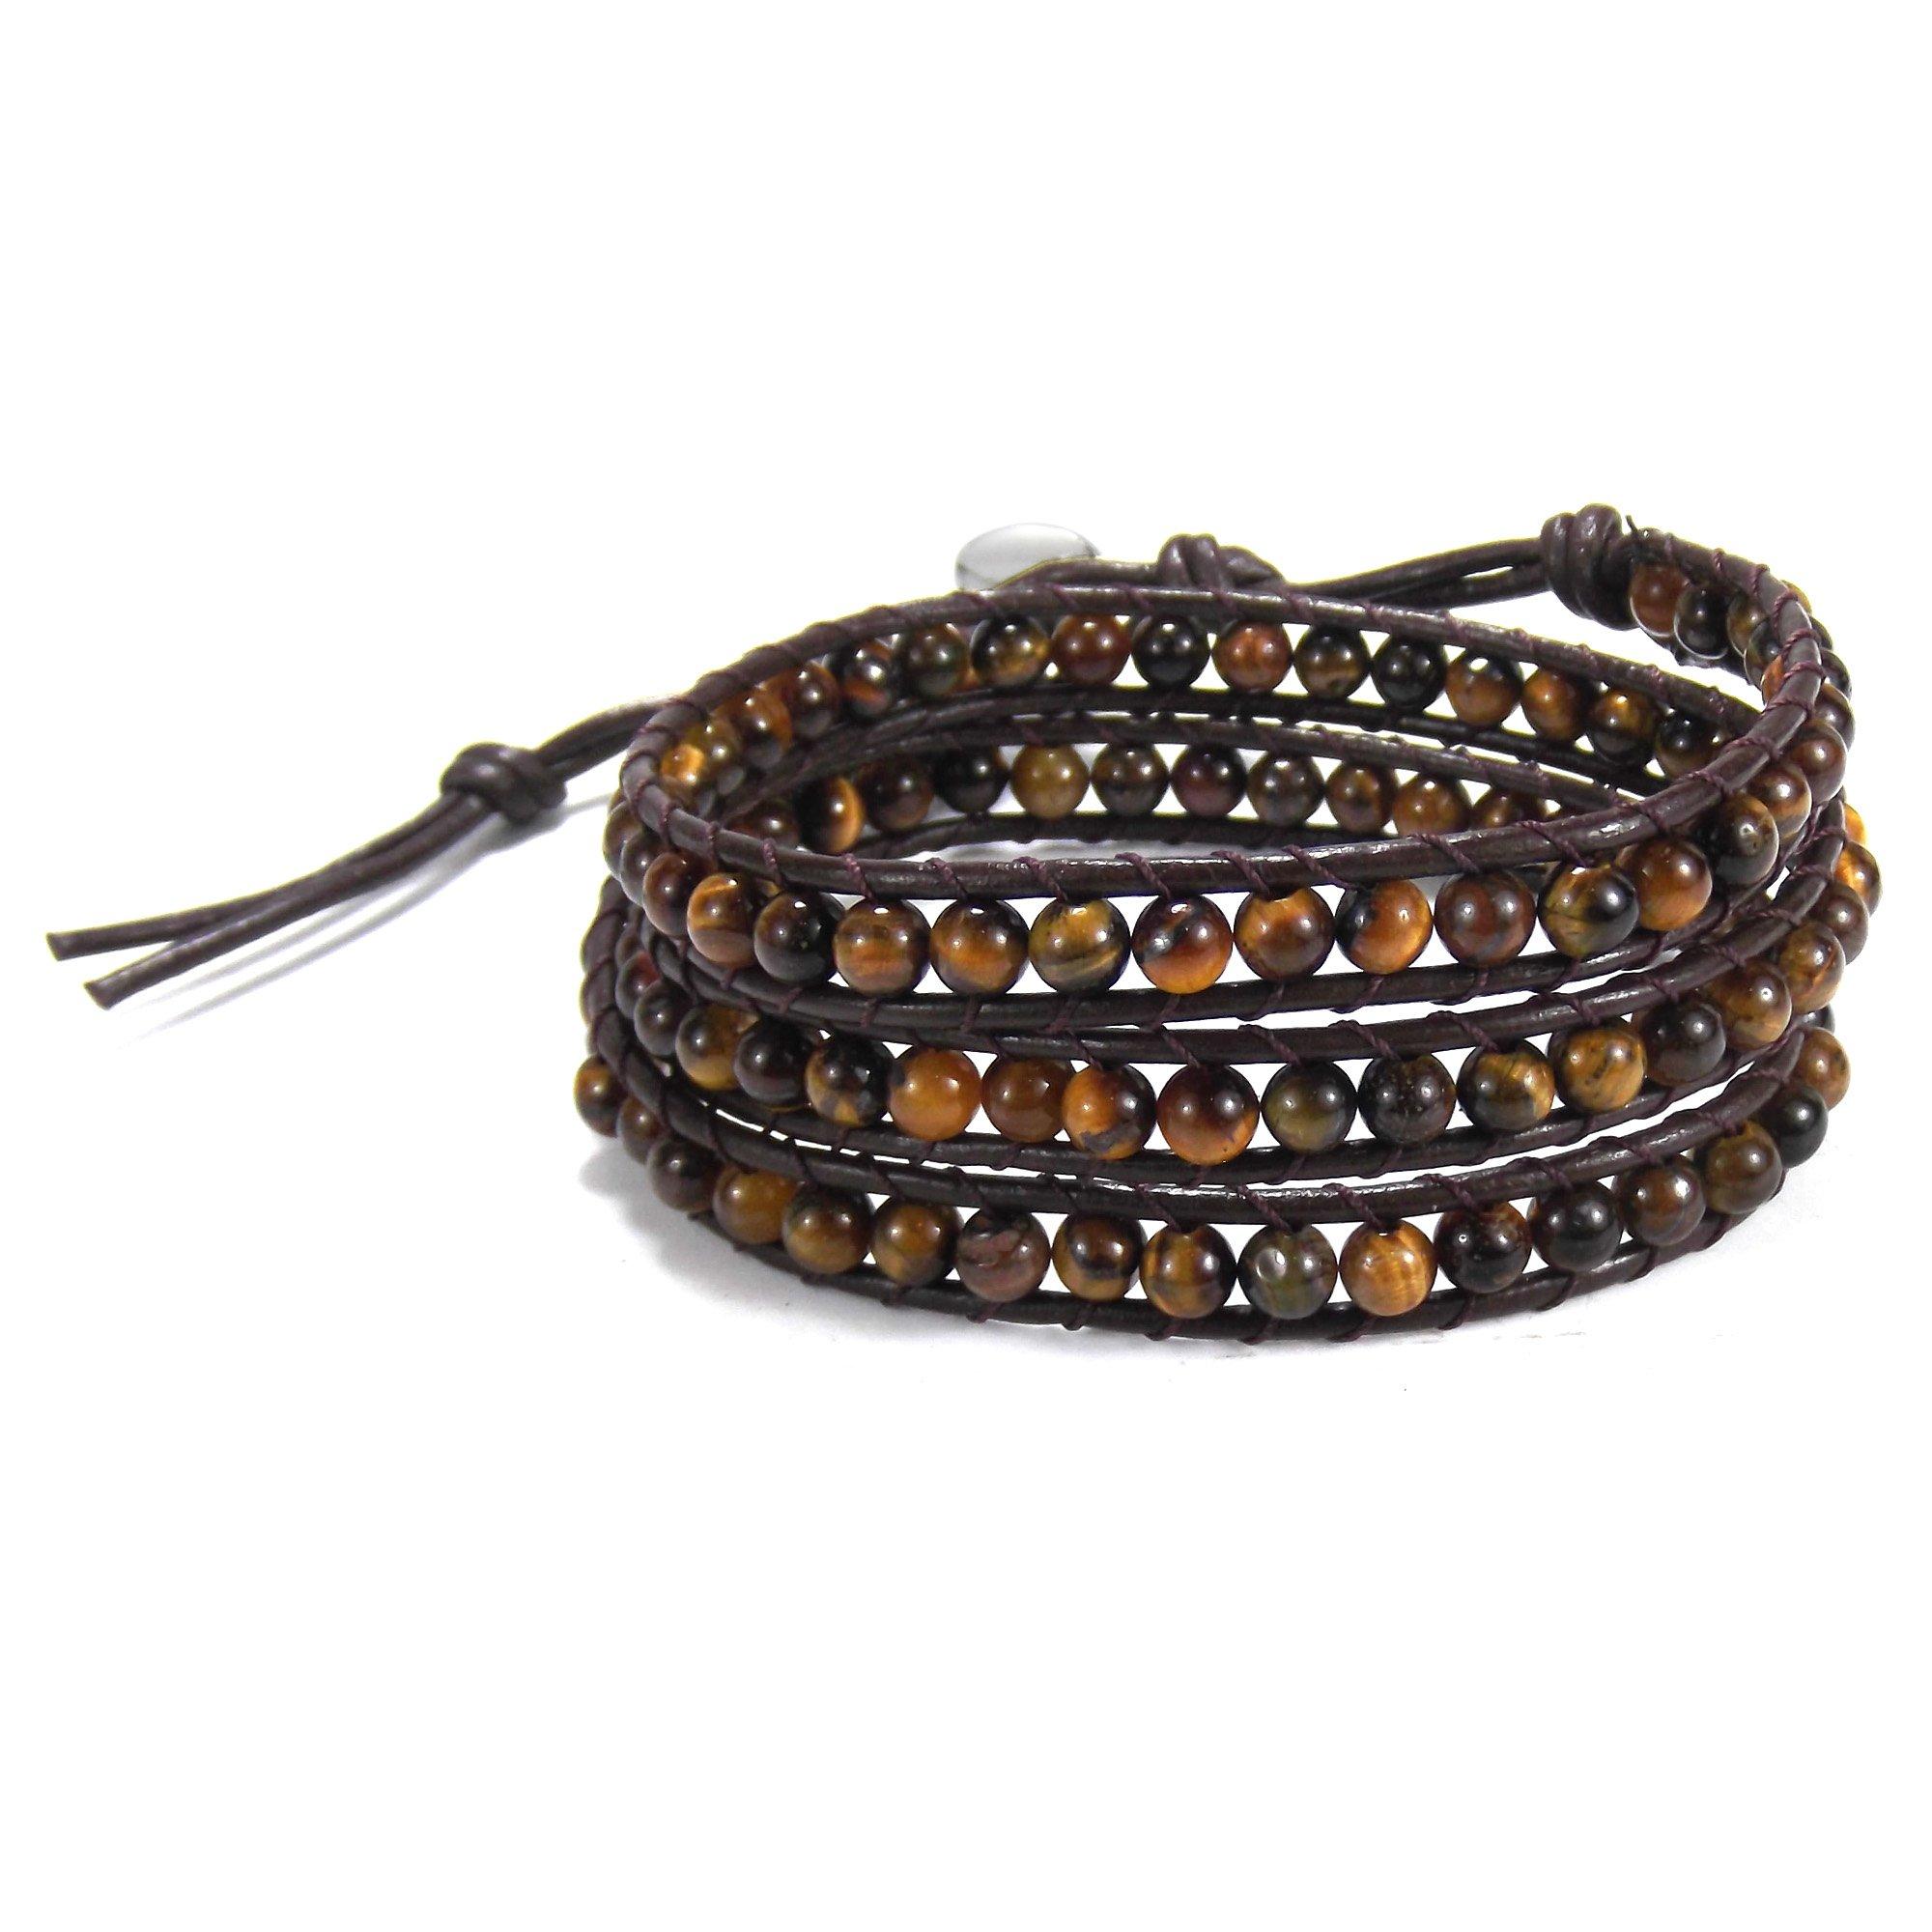 AeraVida Dark Brown Muse Tiger's Eye-Cotton Wax Rope-Leather With Base Metal Clasp Tribal Wrap Bracelet